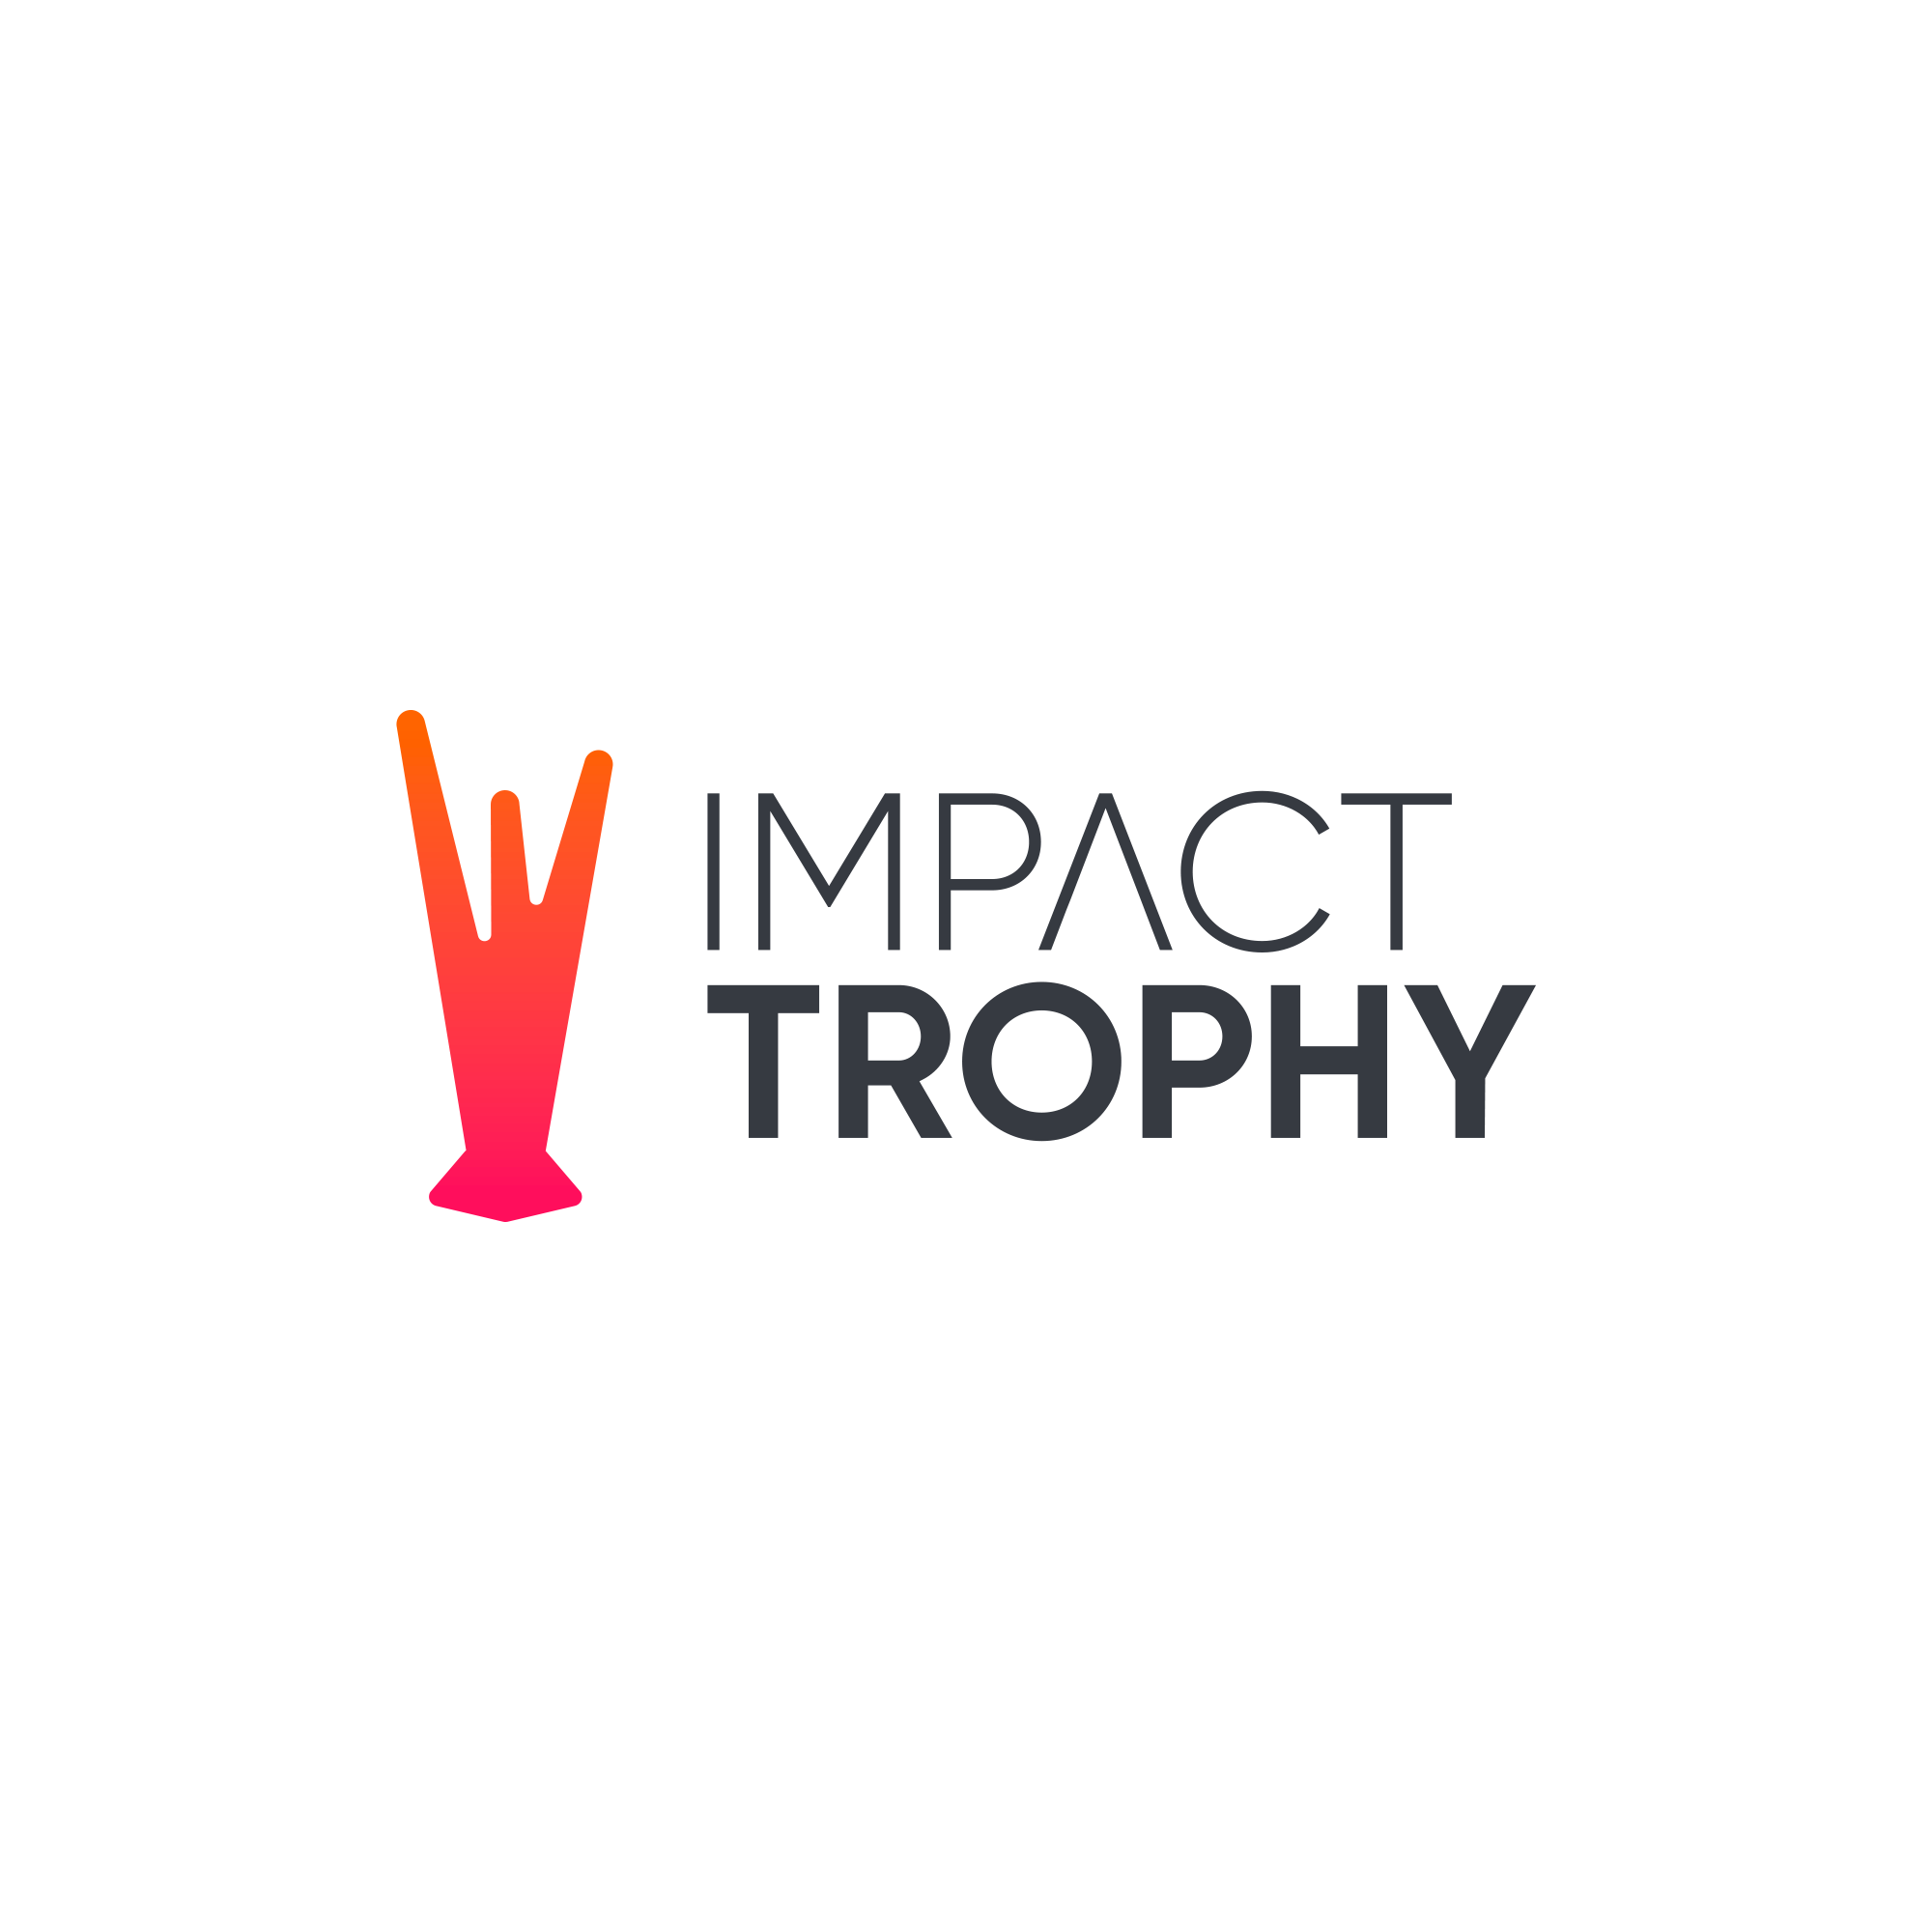 Impact Trophy